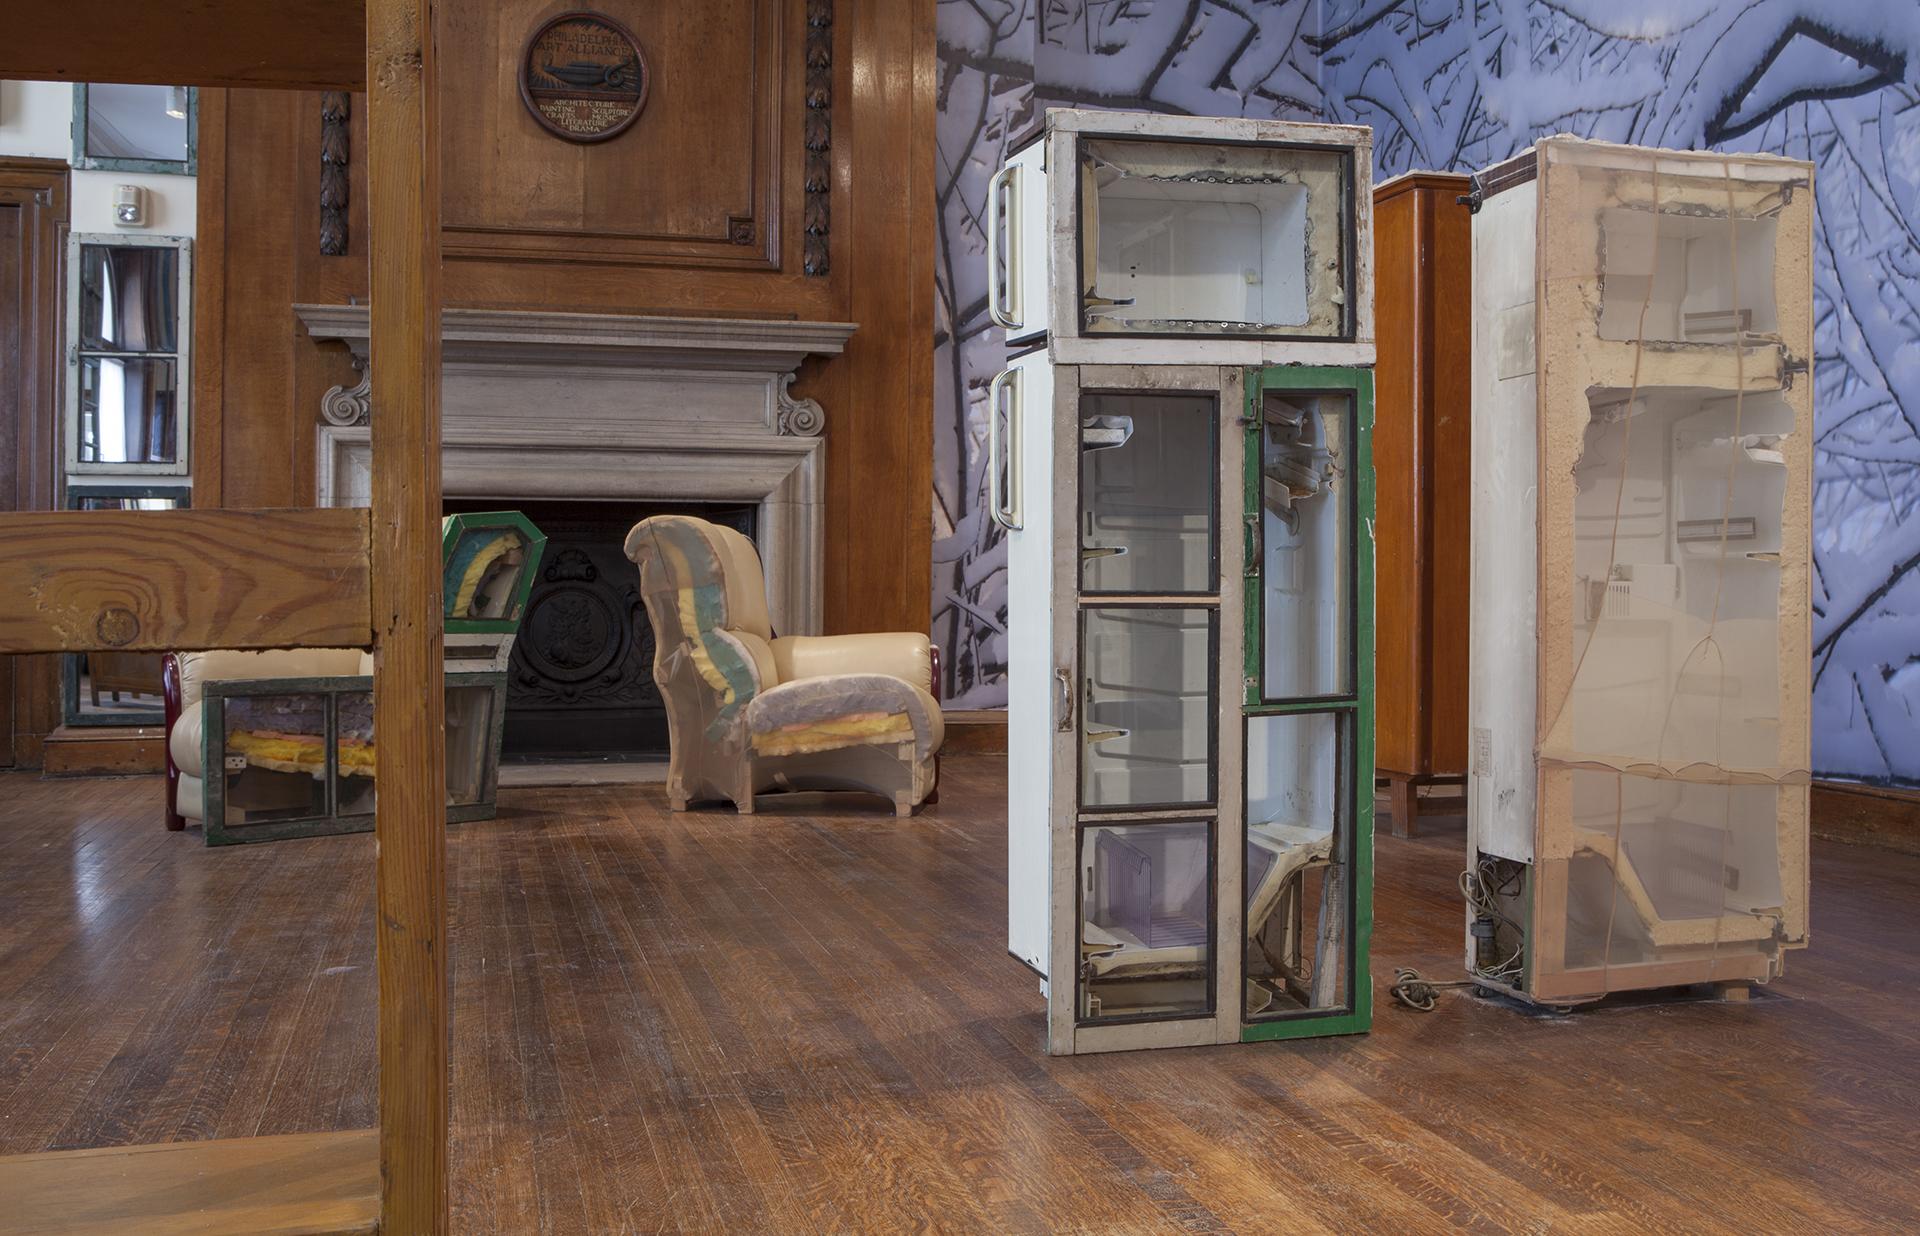 2013-09-30-Furniture2_photocreditMattSuib_GreenhouseMedia.jpg